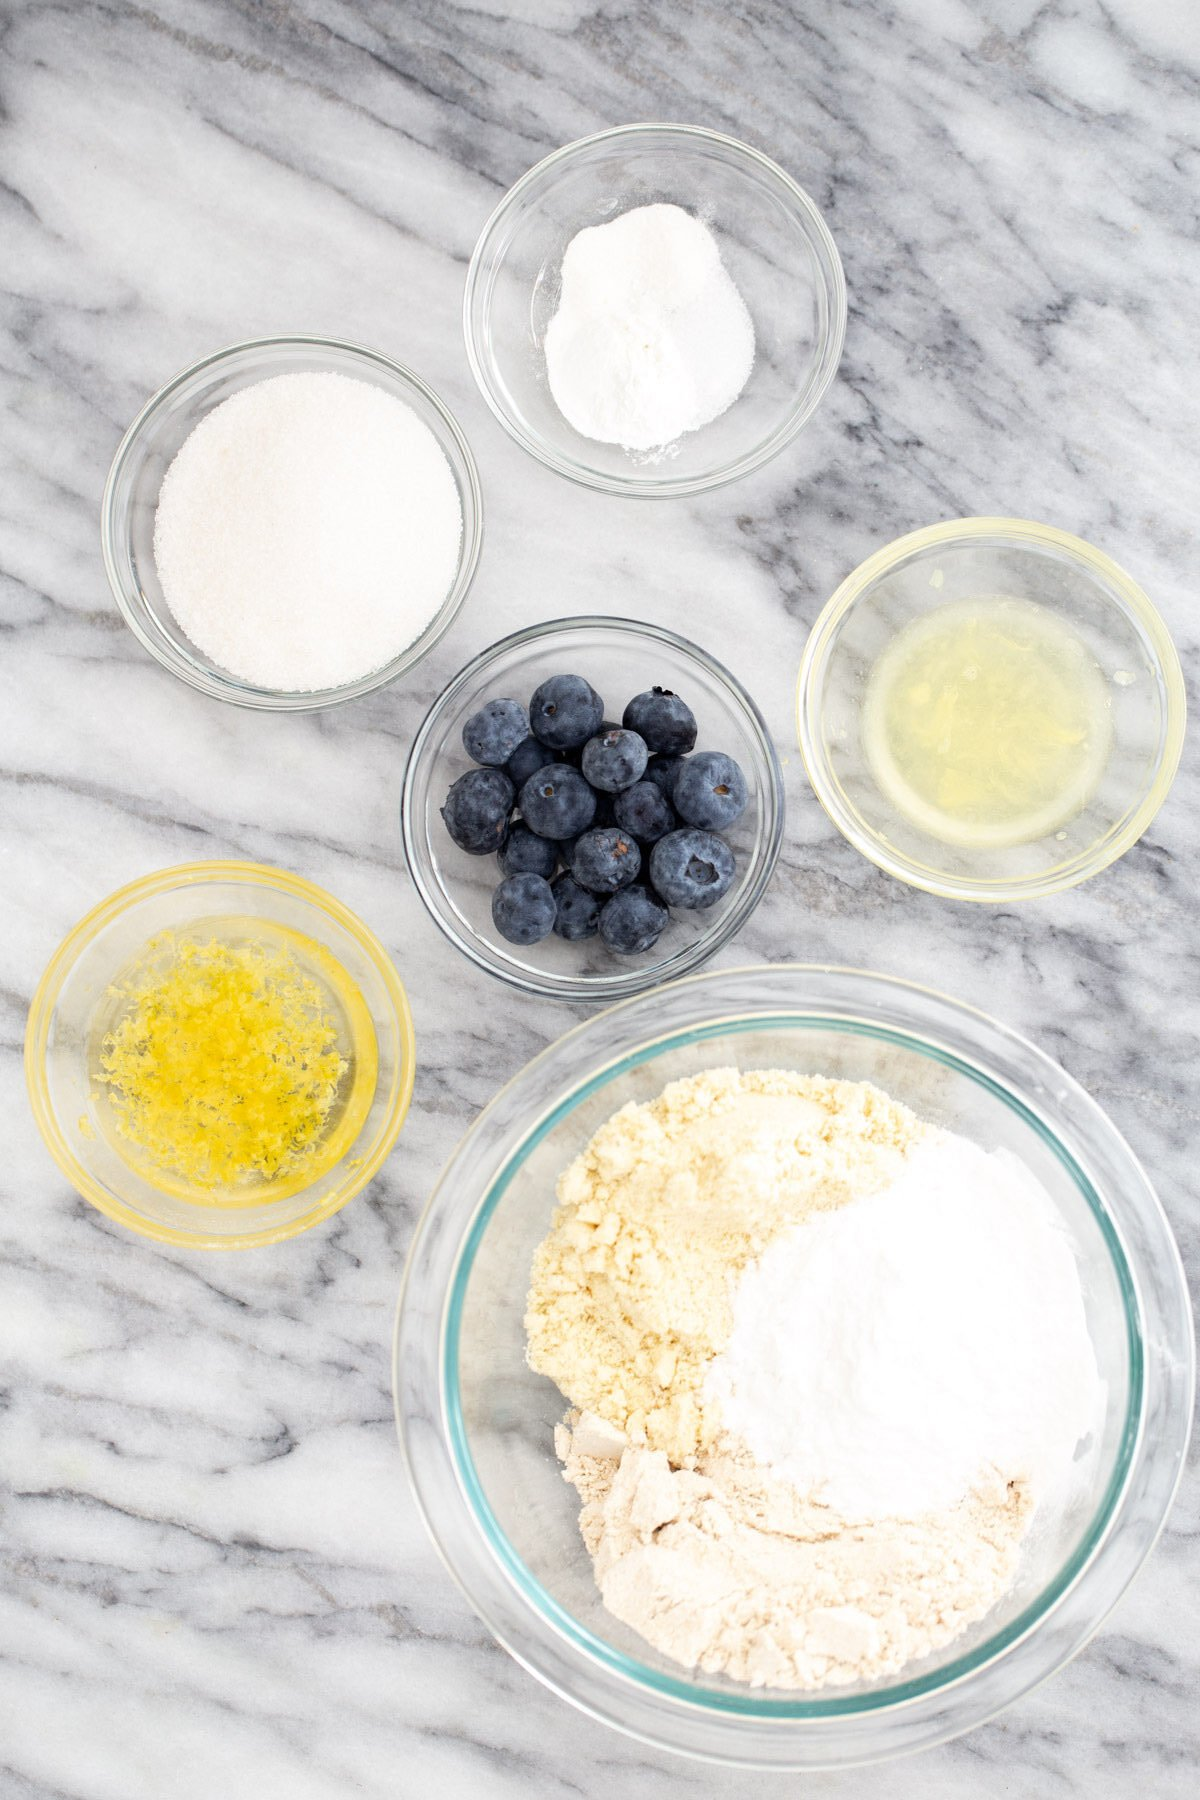 ingredients needed for making glutenfree vegan lemon blueberry waffles